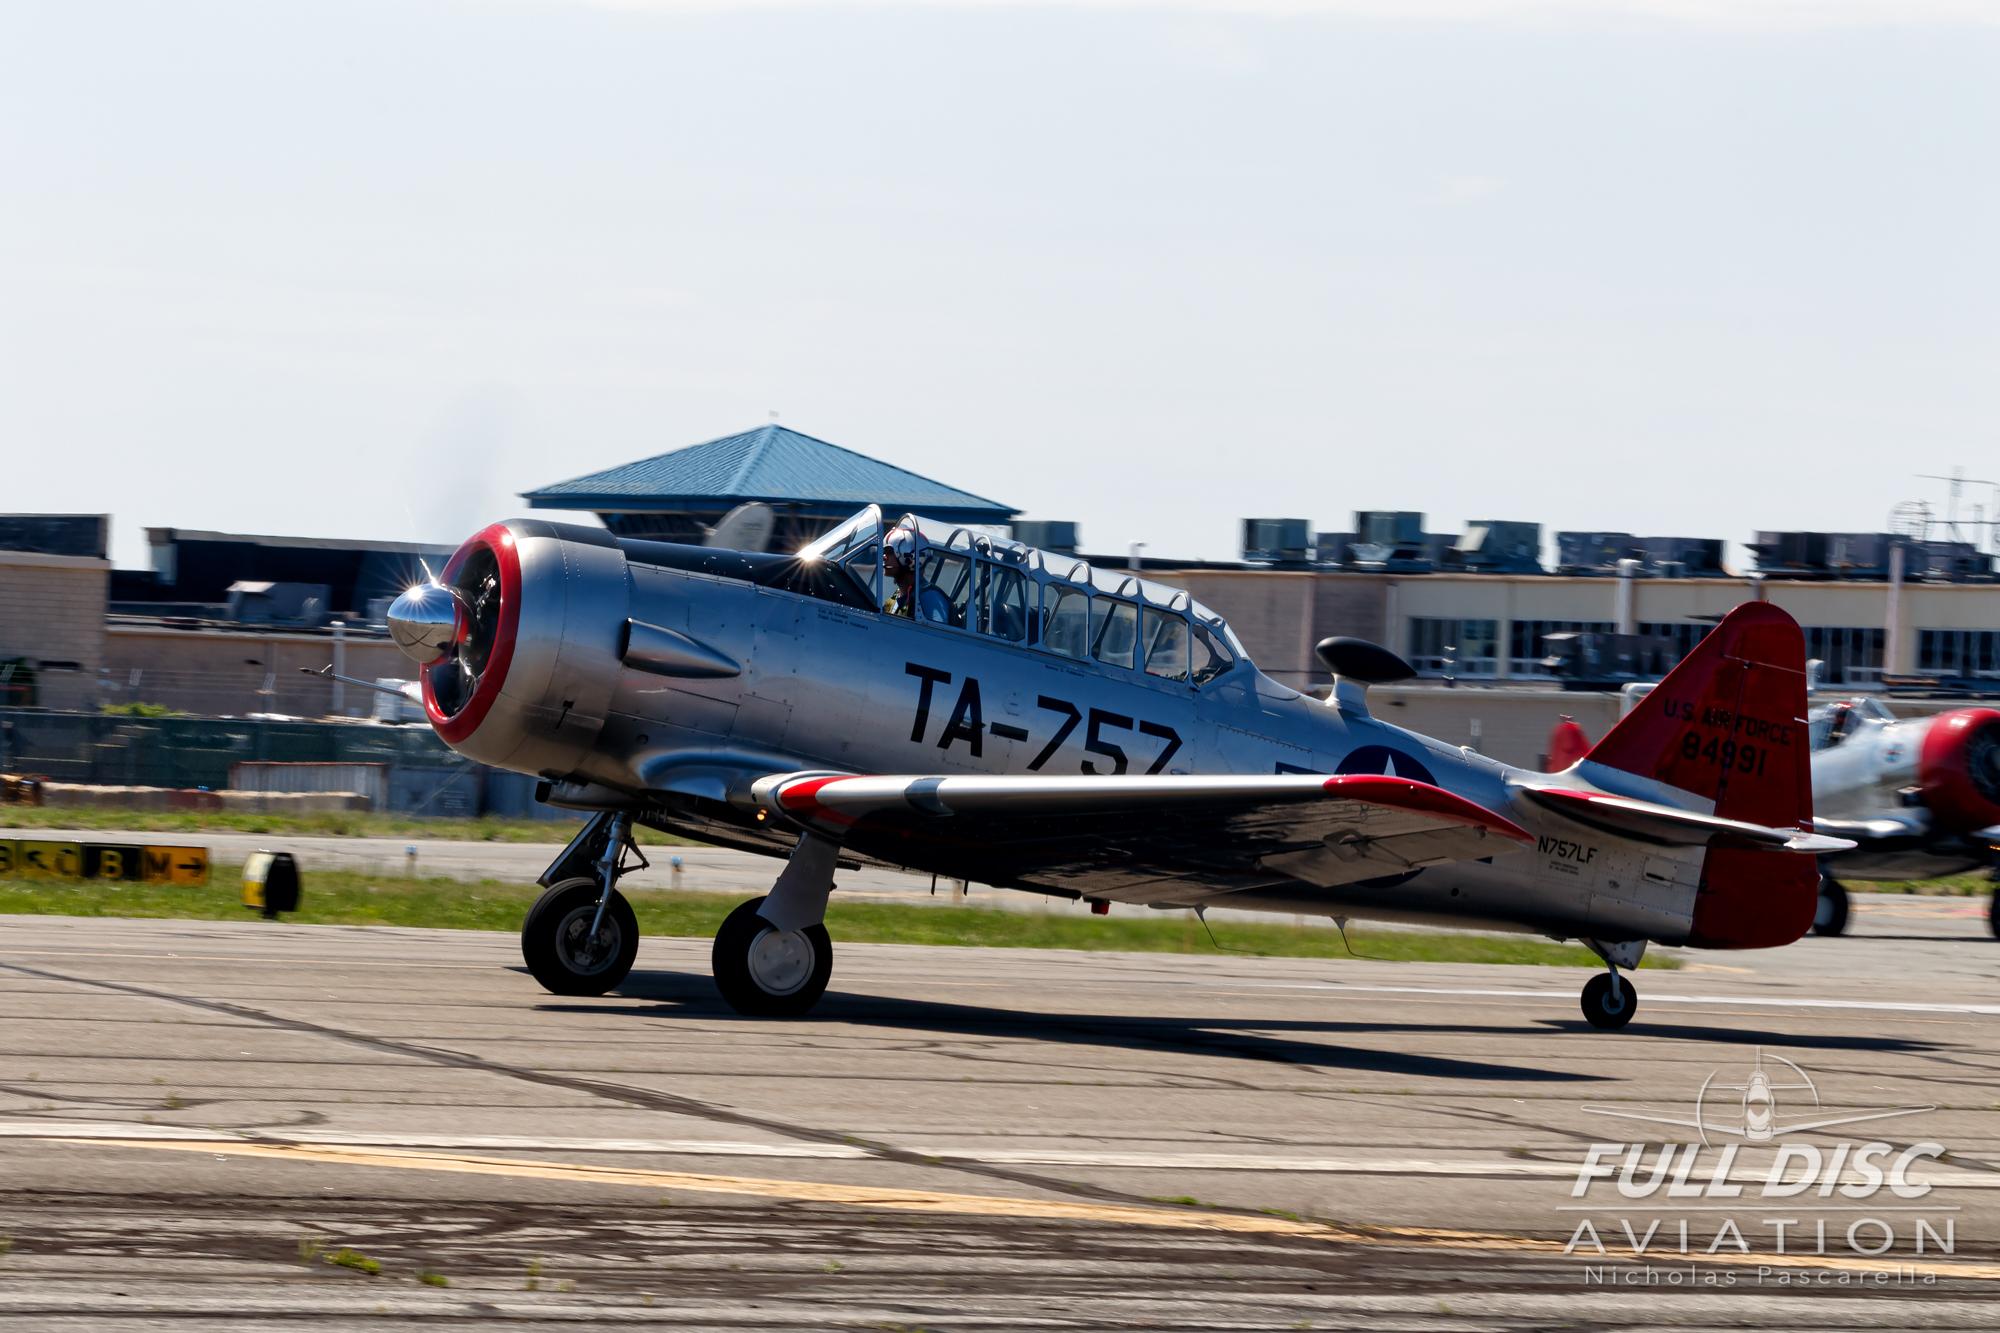 americanairpowermuseum_nicholaspascarella_nickpascarella_fulldiscaviation_legendsofairpower2019_aviation_warbird_t6_texan_takeoff.jpg